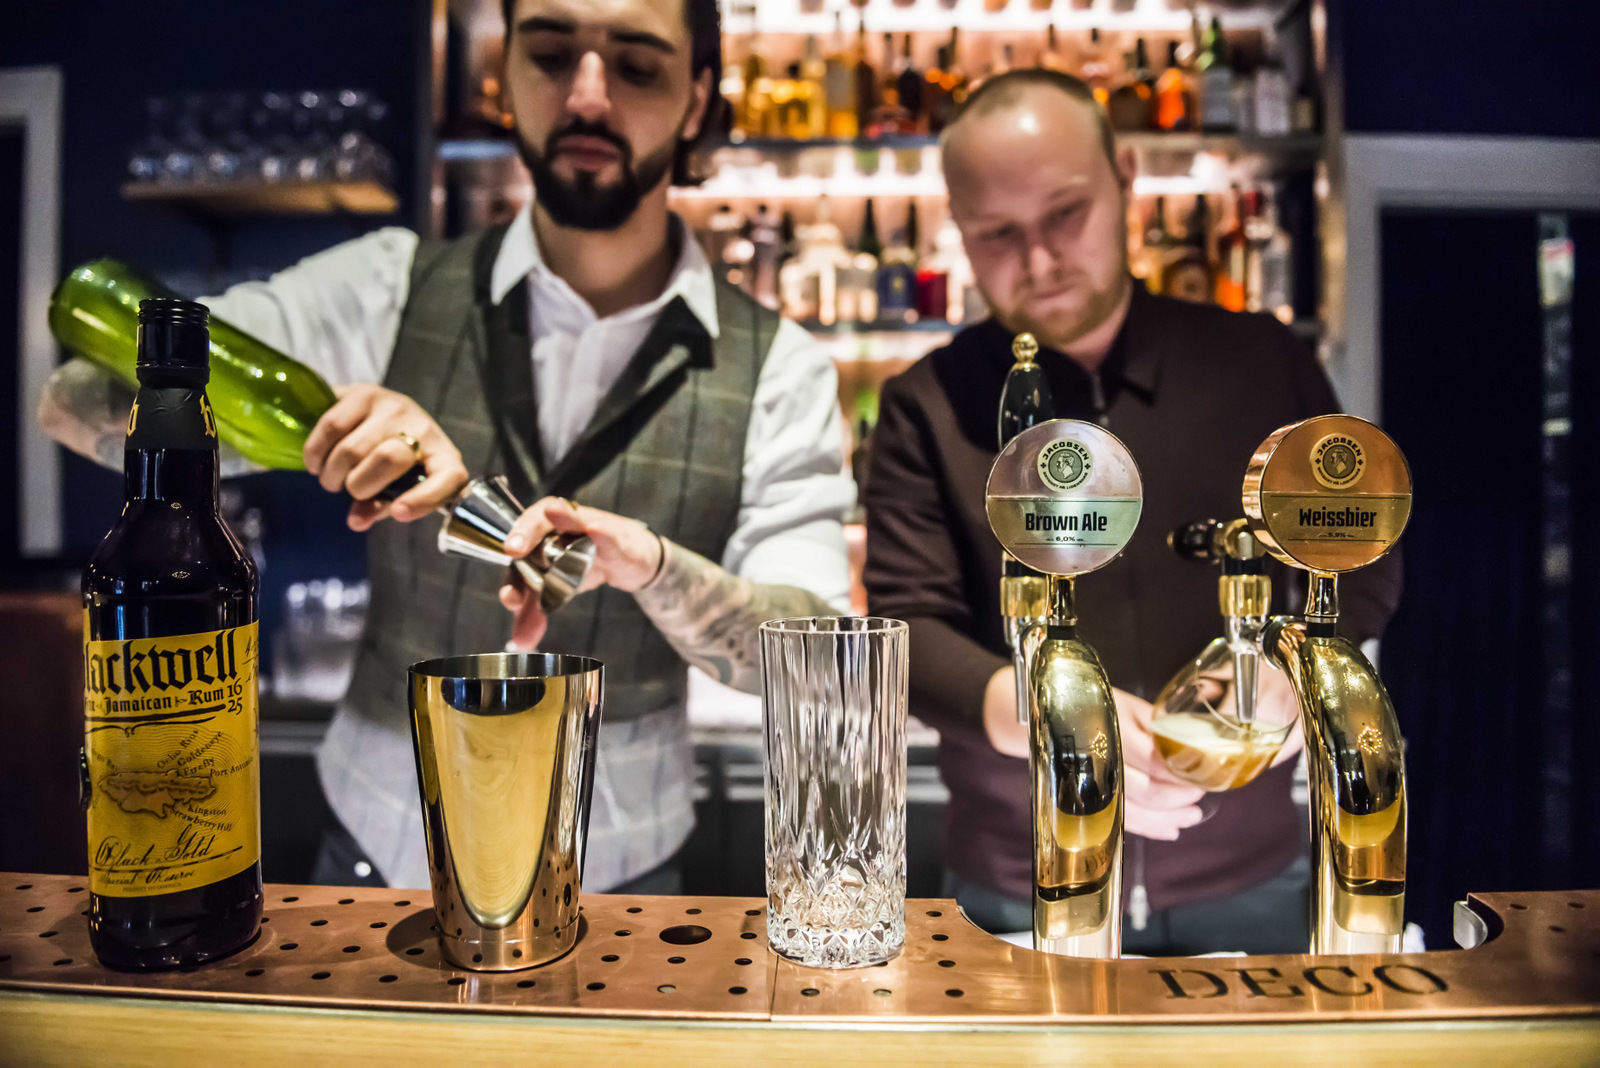 Byens Bedste Cocktailbar 2019